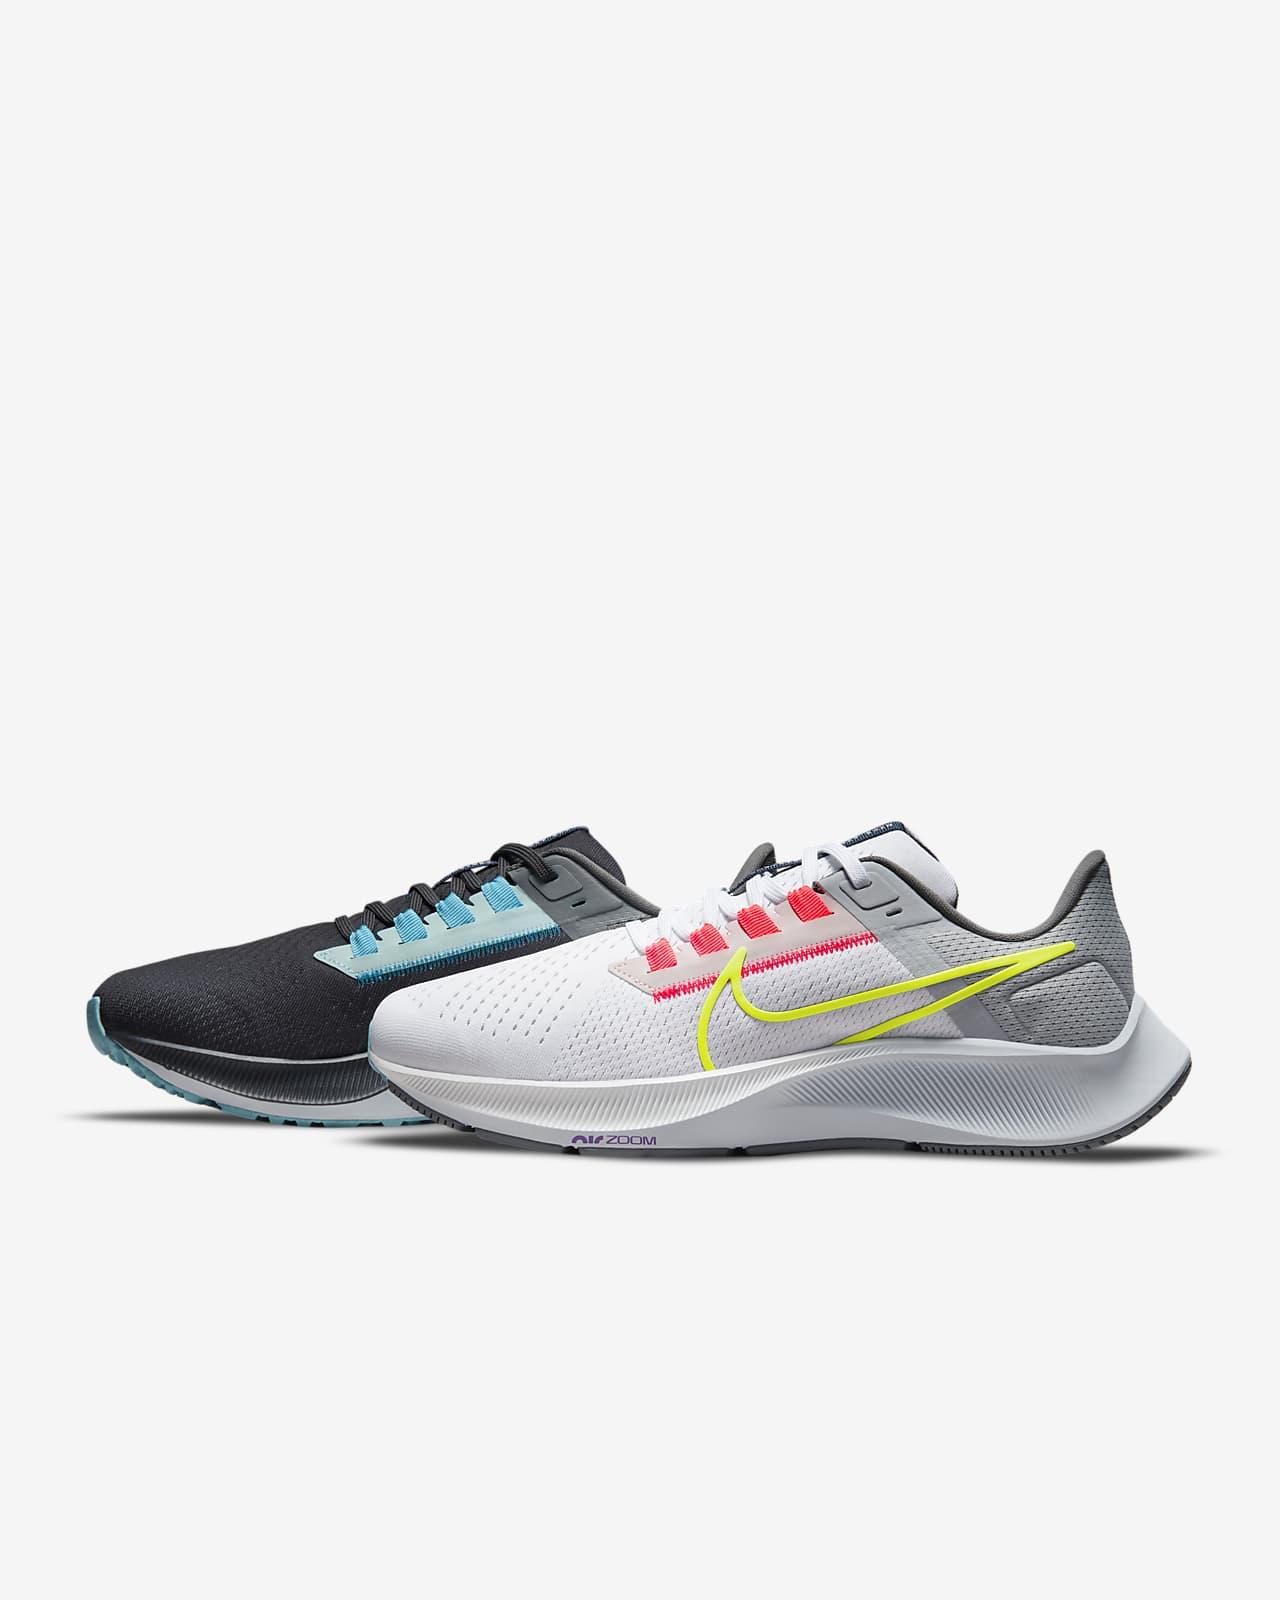 Sapatilhas de running Nike Air Zoom Pegasus 38 Limited Edition para mulher